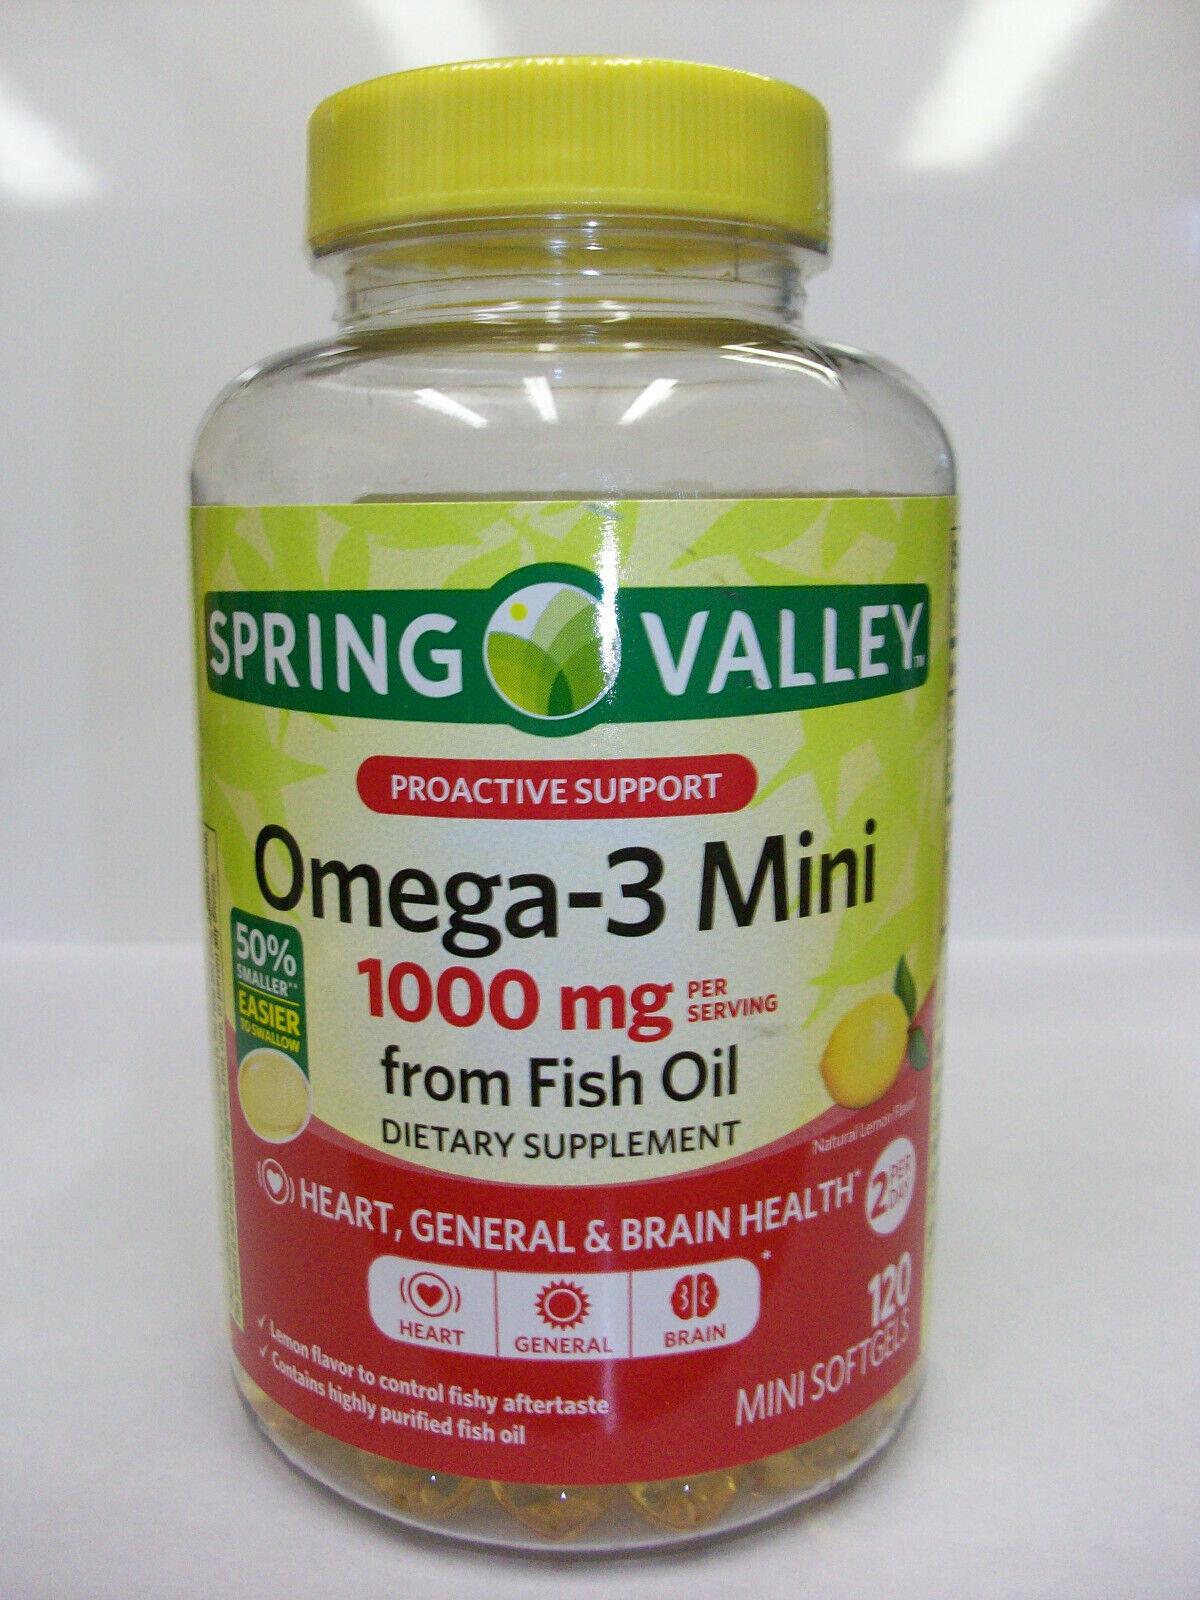 Spring Valley Omega-3 Mini  1,000 mg  120 Mini Softgels